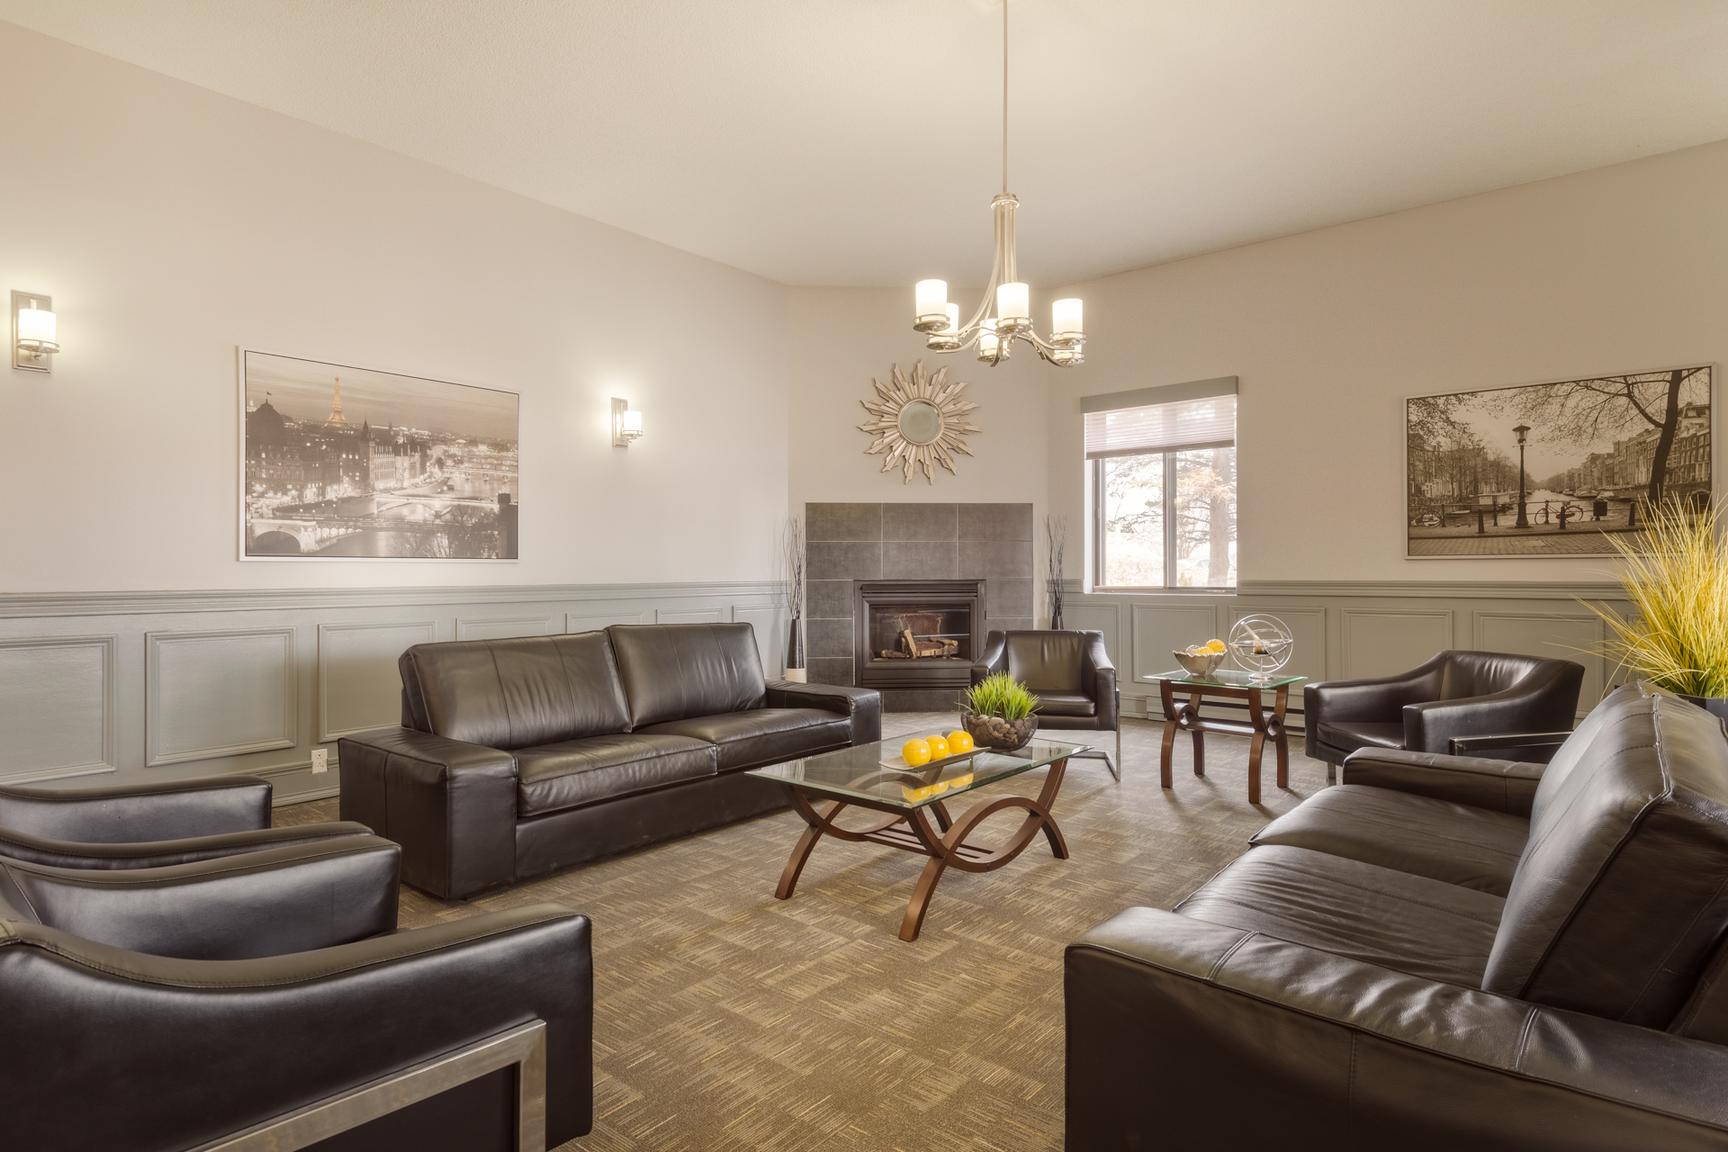 2 bedroom Apartments for rent in Laval at Le Quatre Cent - Photo 24 - RentQuebecApartments – L407185